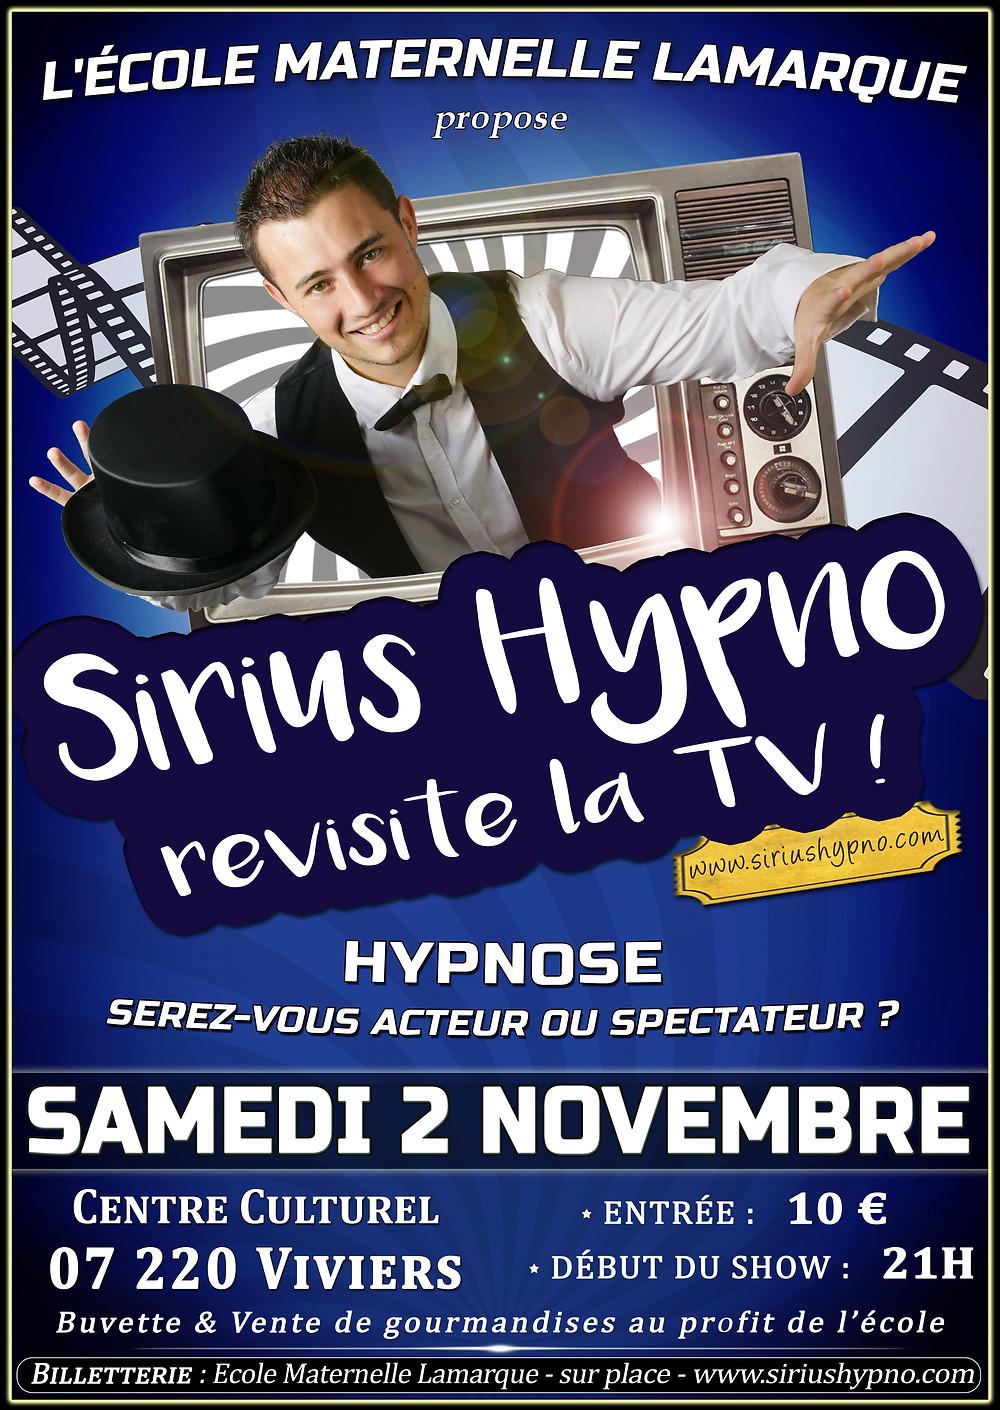 Affiche Spectacle Sirius Hypnose Hypnose Hypnotiseur de spectacle Viviers 2019